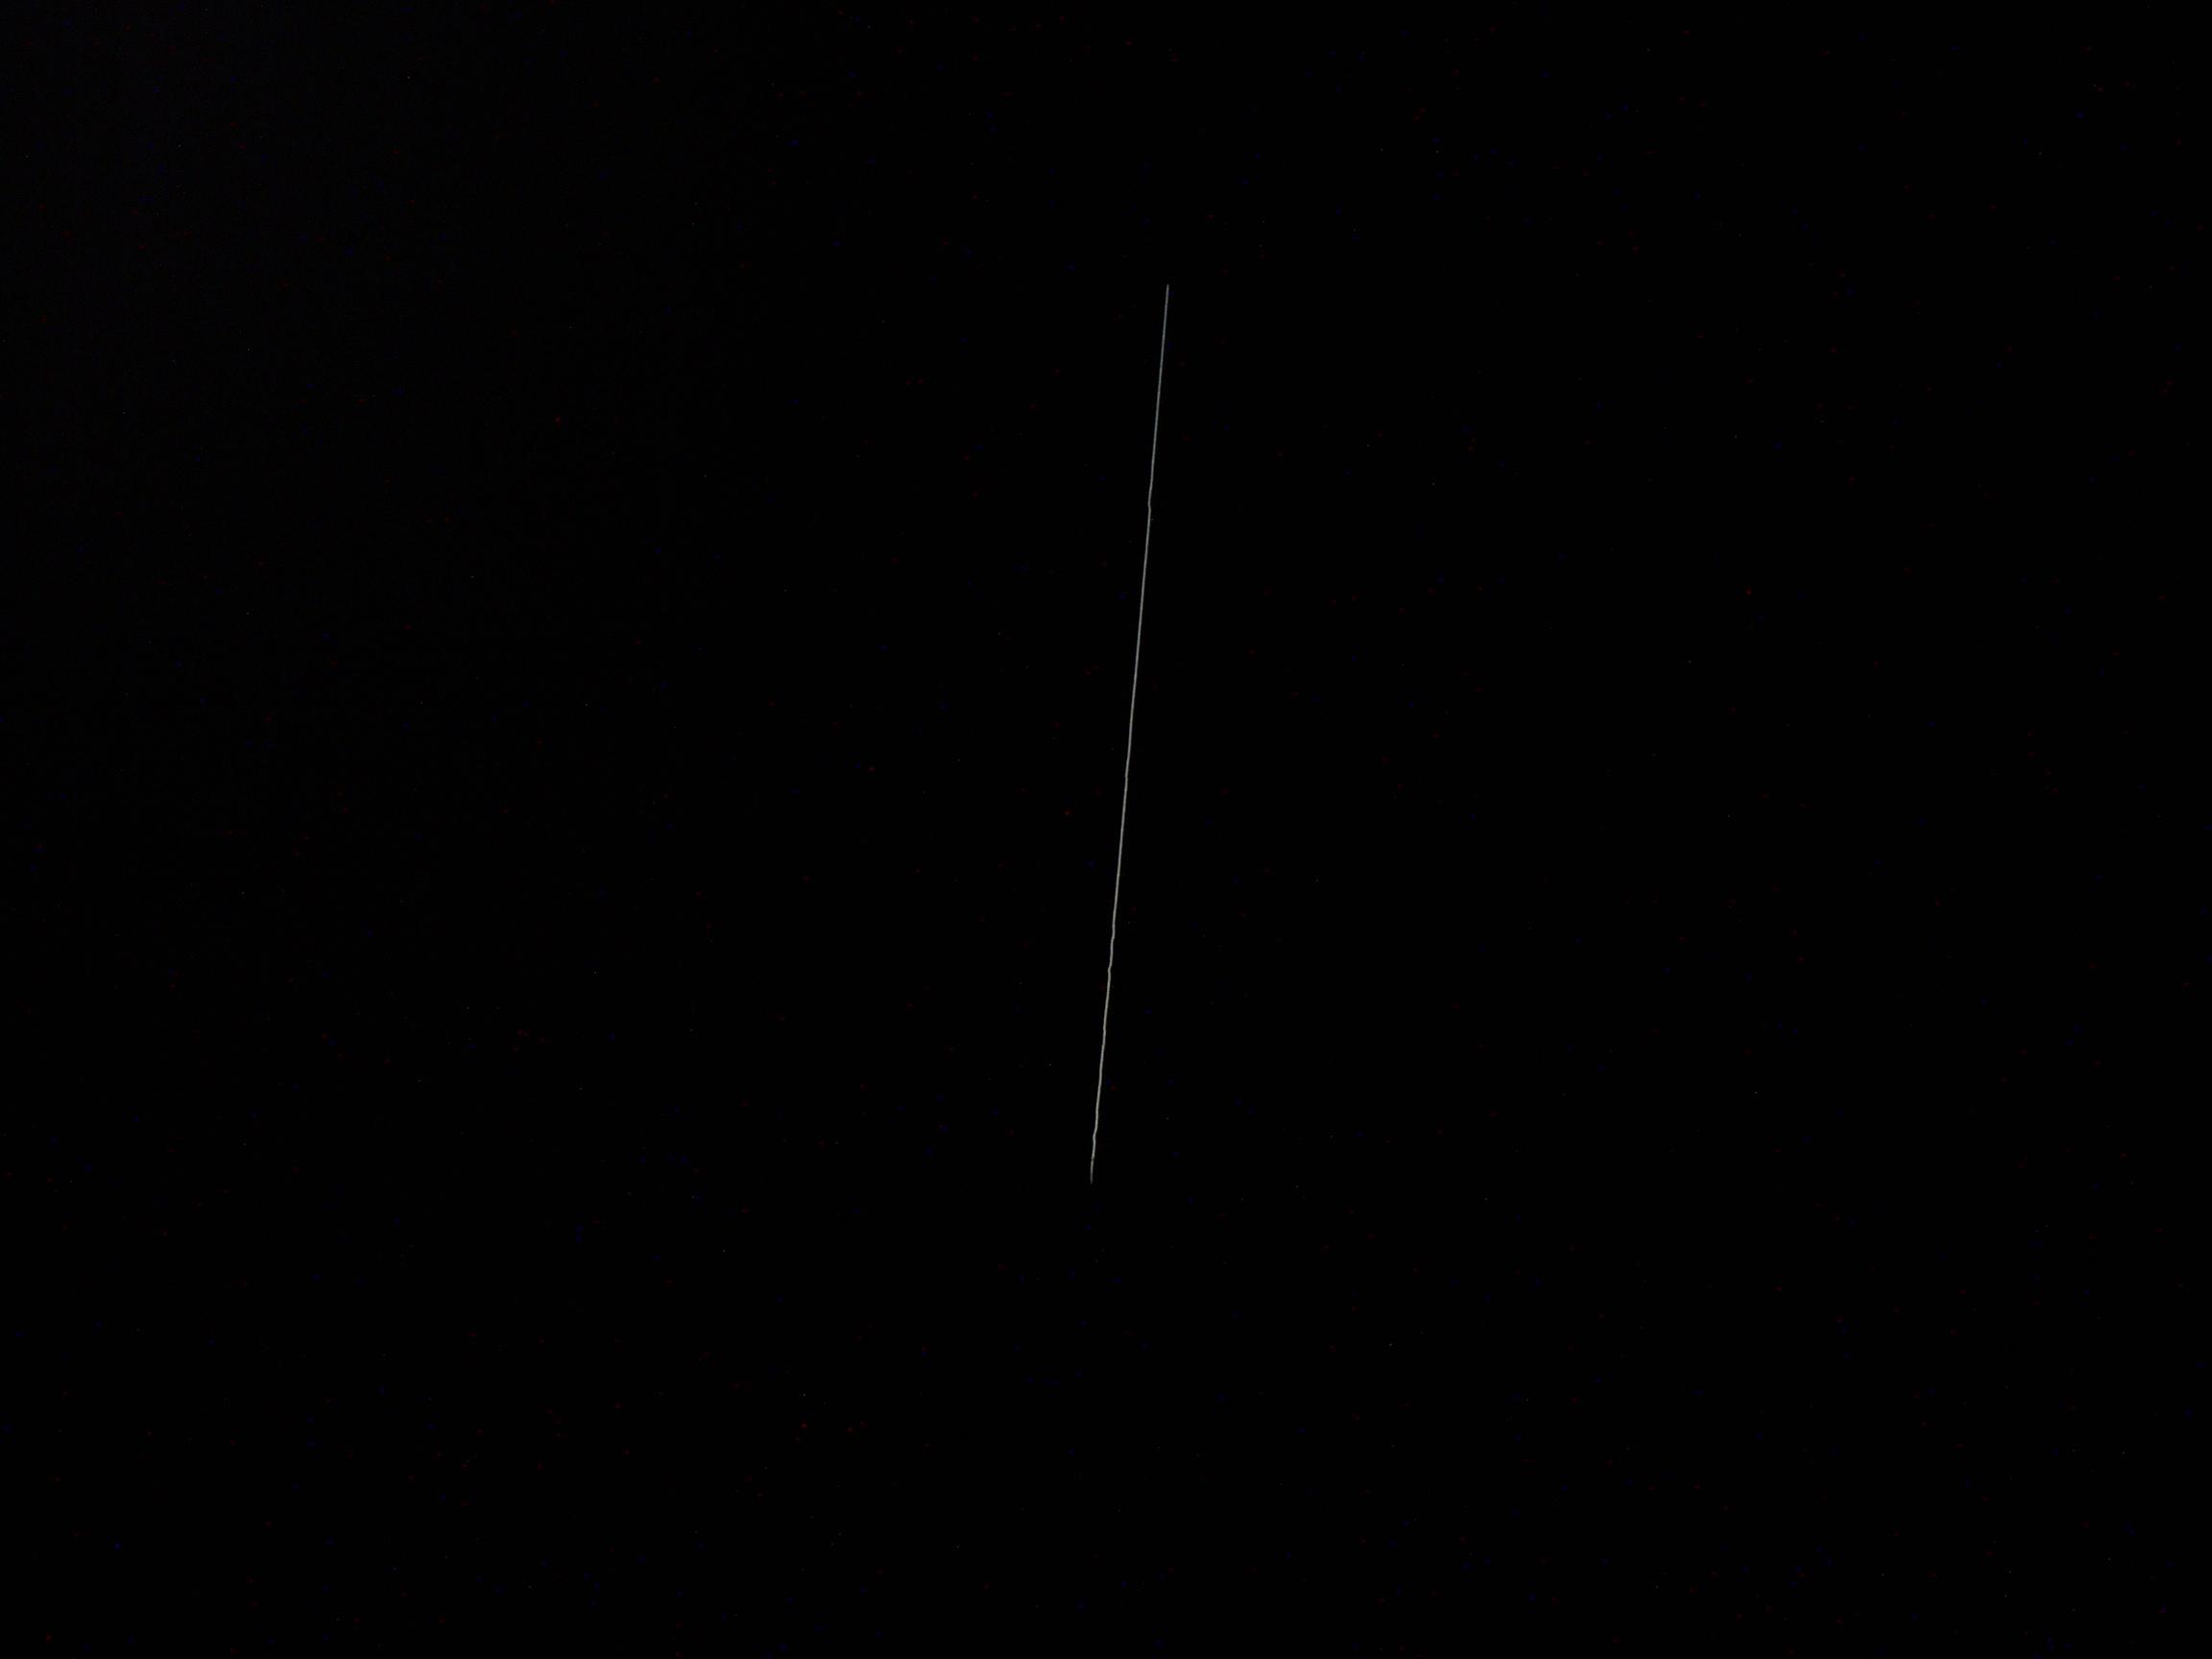 http://forum.kosmonautix.cz/dokumenty/ISS-2.3.2011.JPG